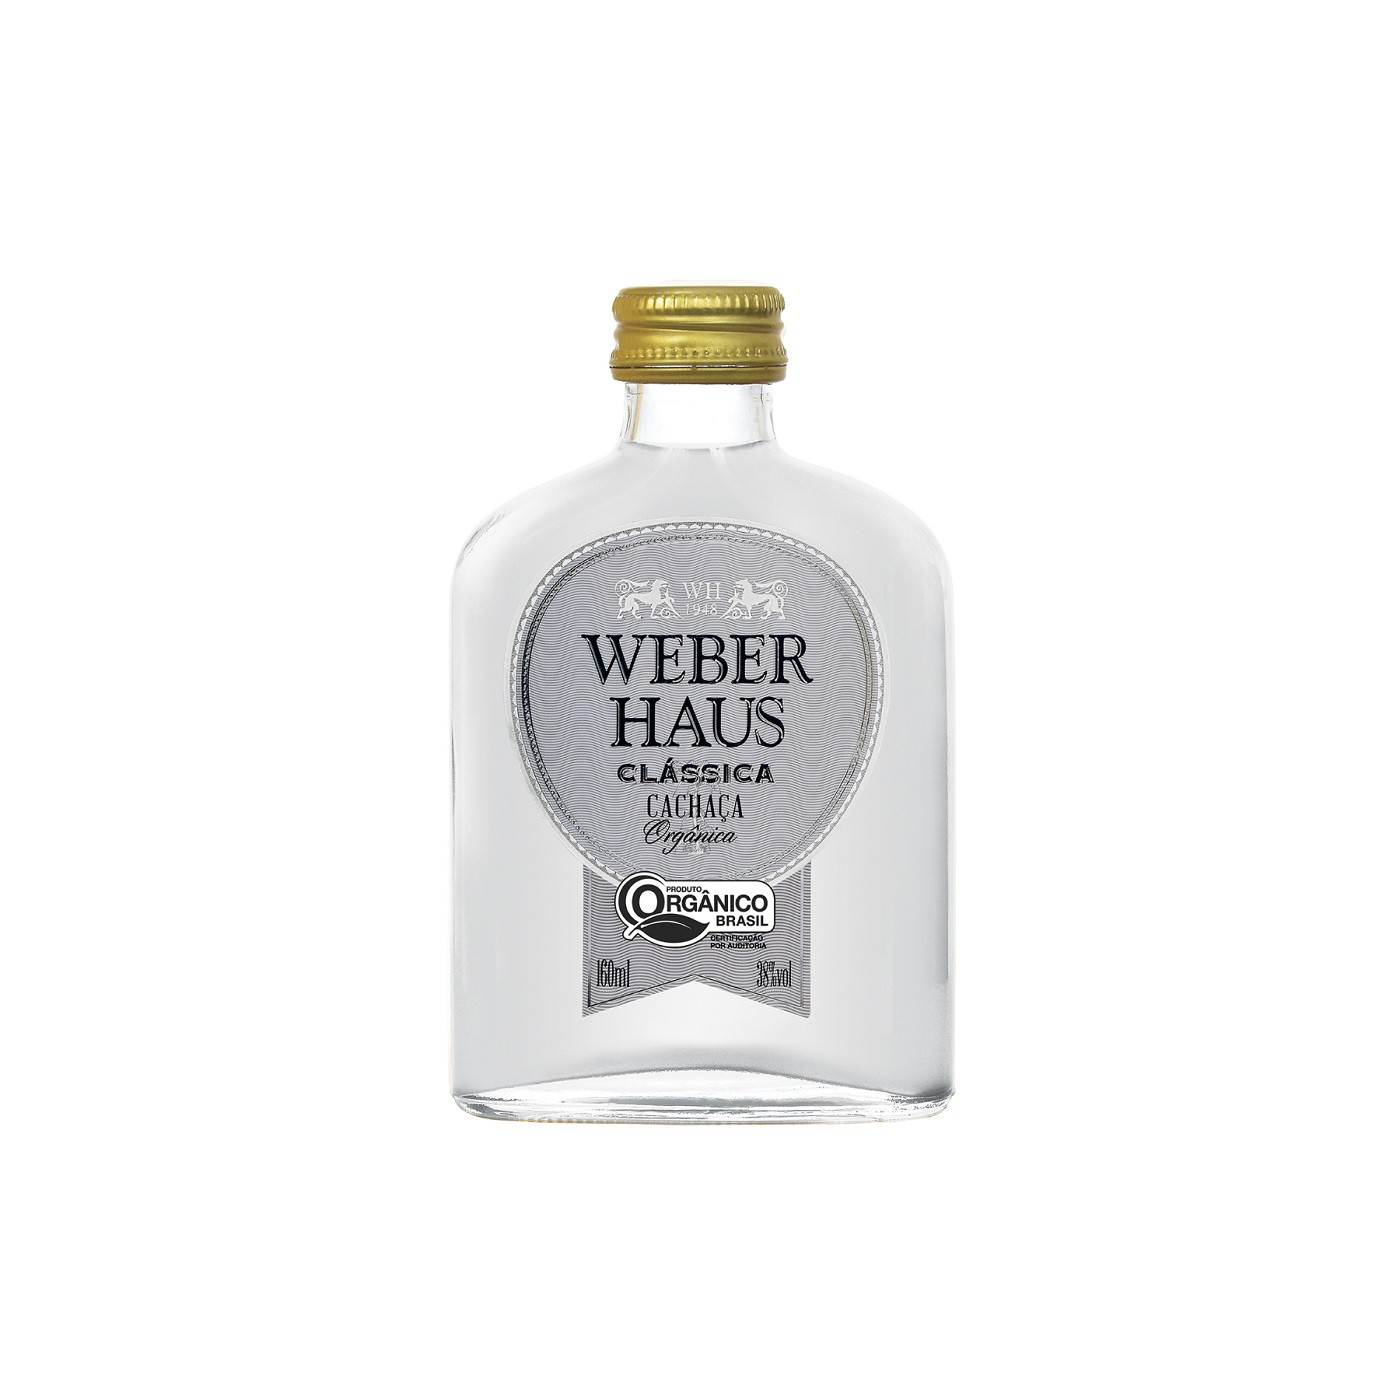 Cachaça Prata Clássica Weber Haus - 160ml